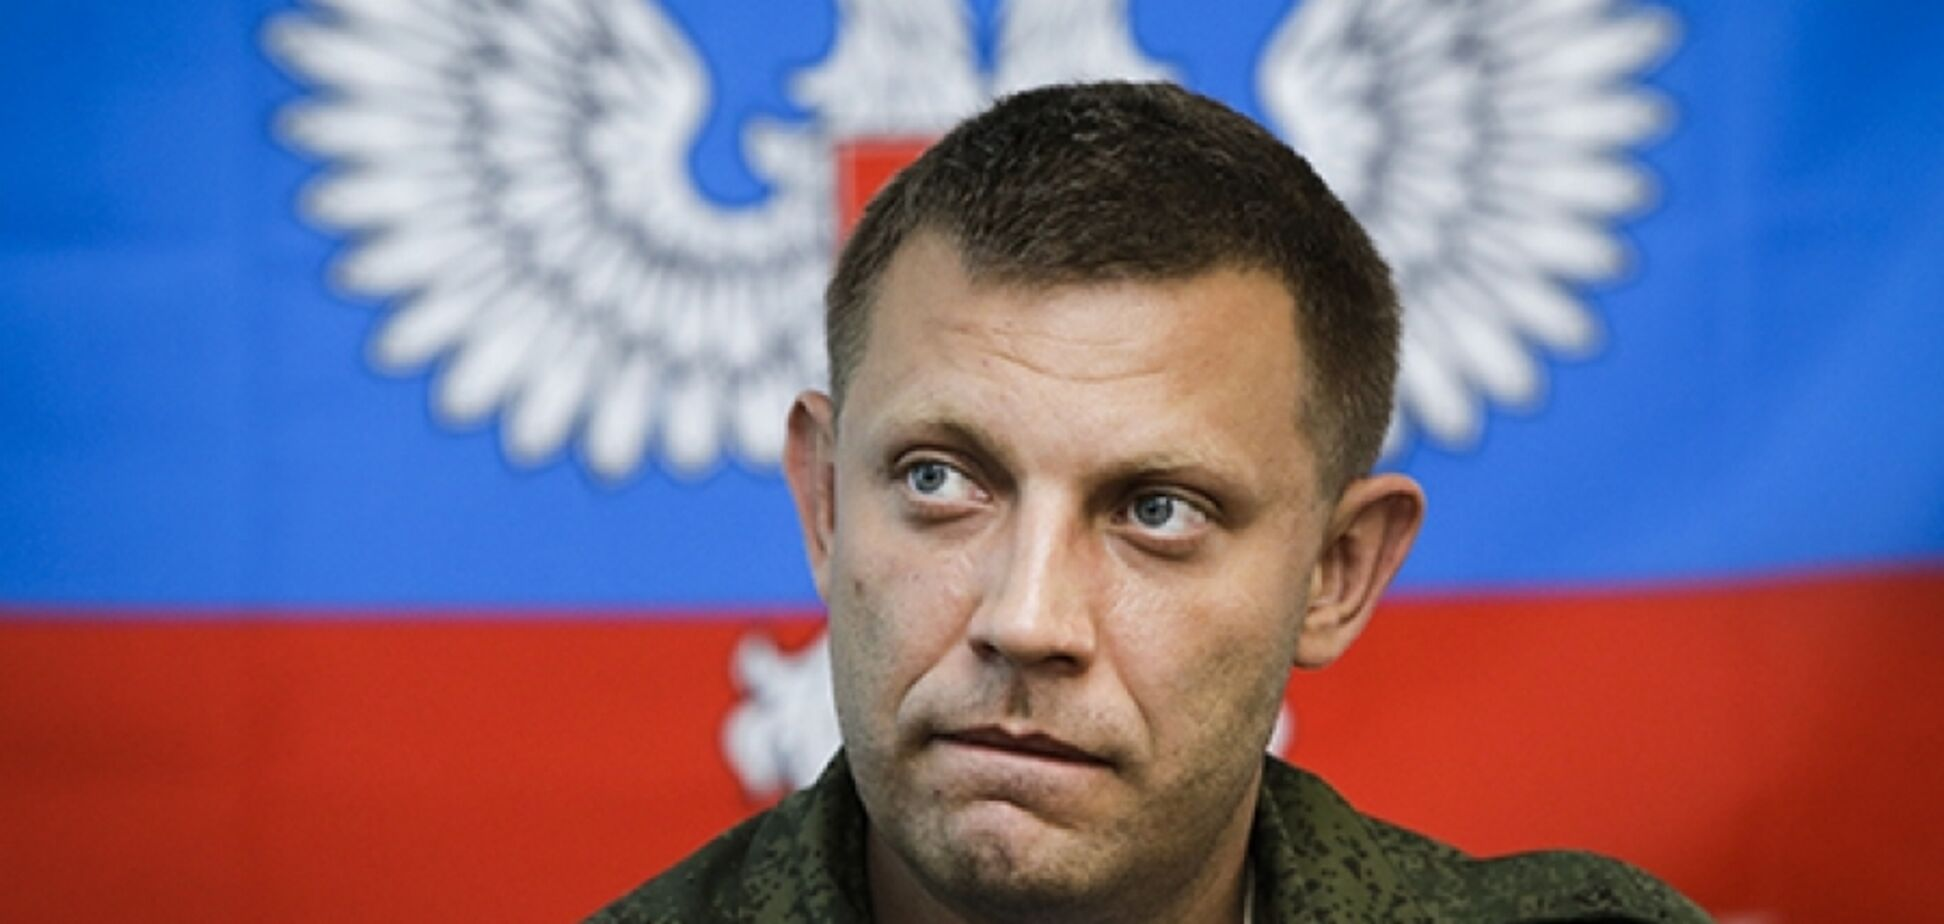 В 'ДНР' задержали убийц Захарченко